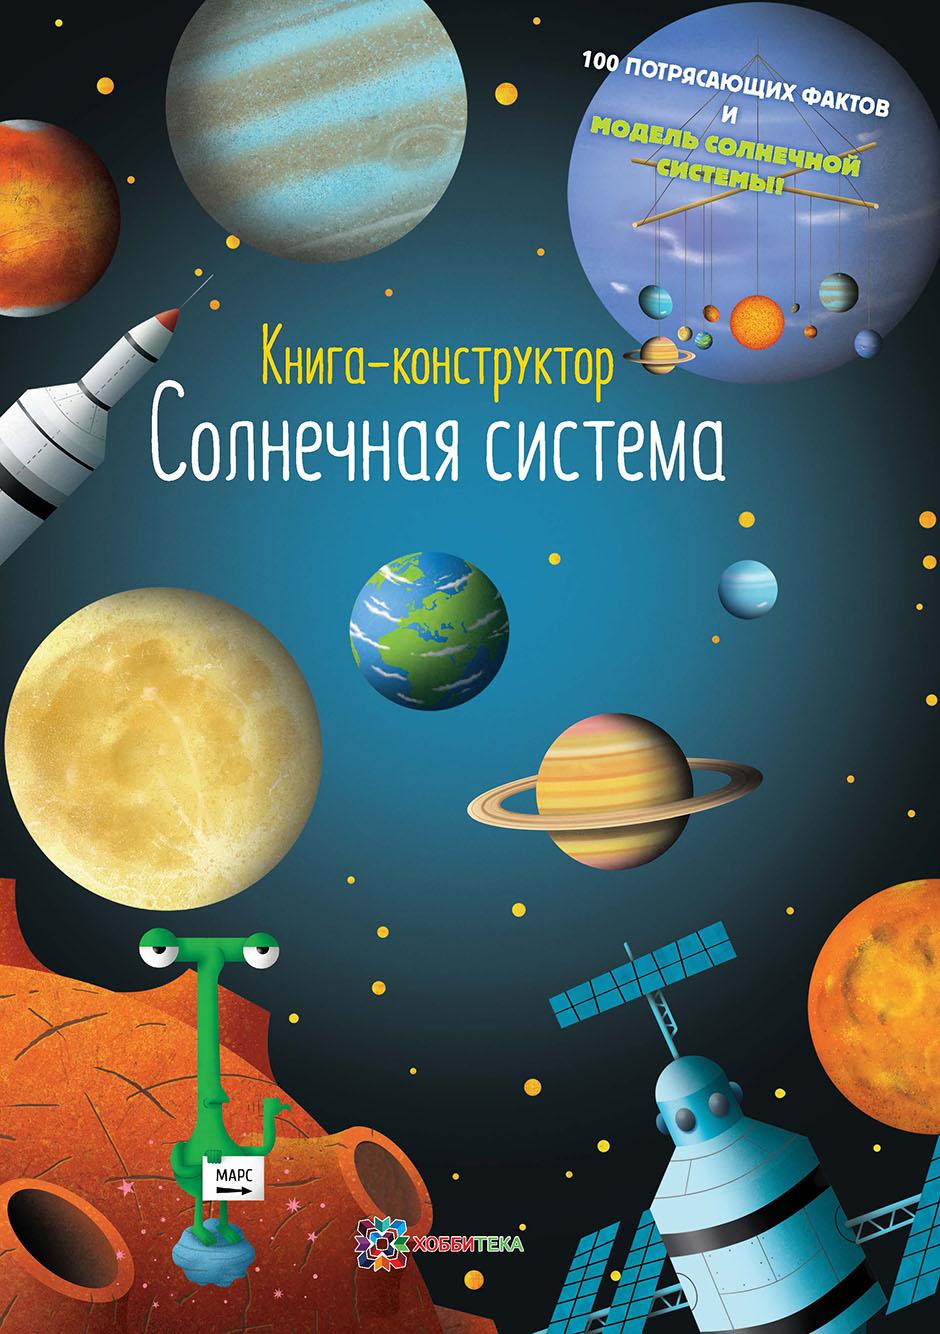 Книга-конструктор «Солнечная система»